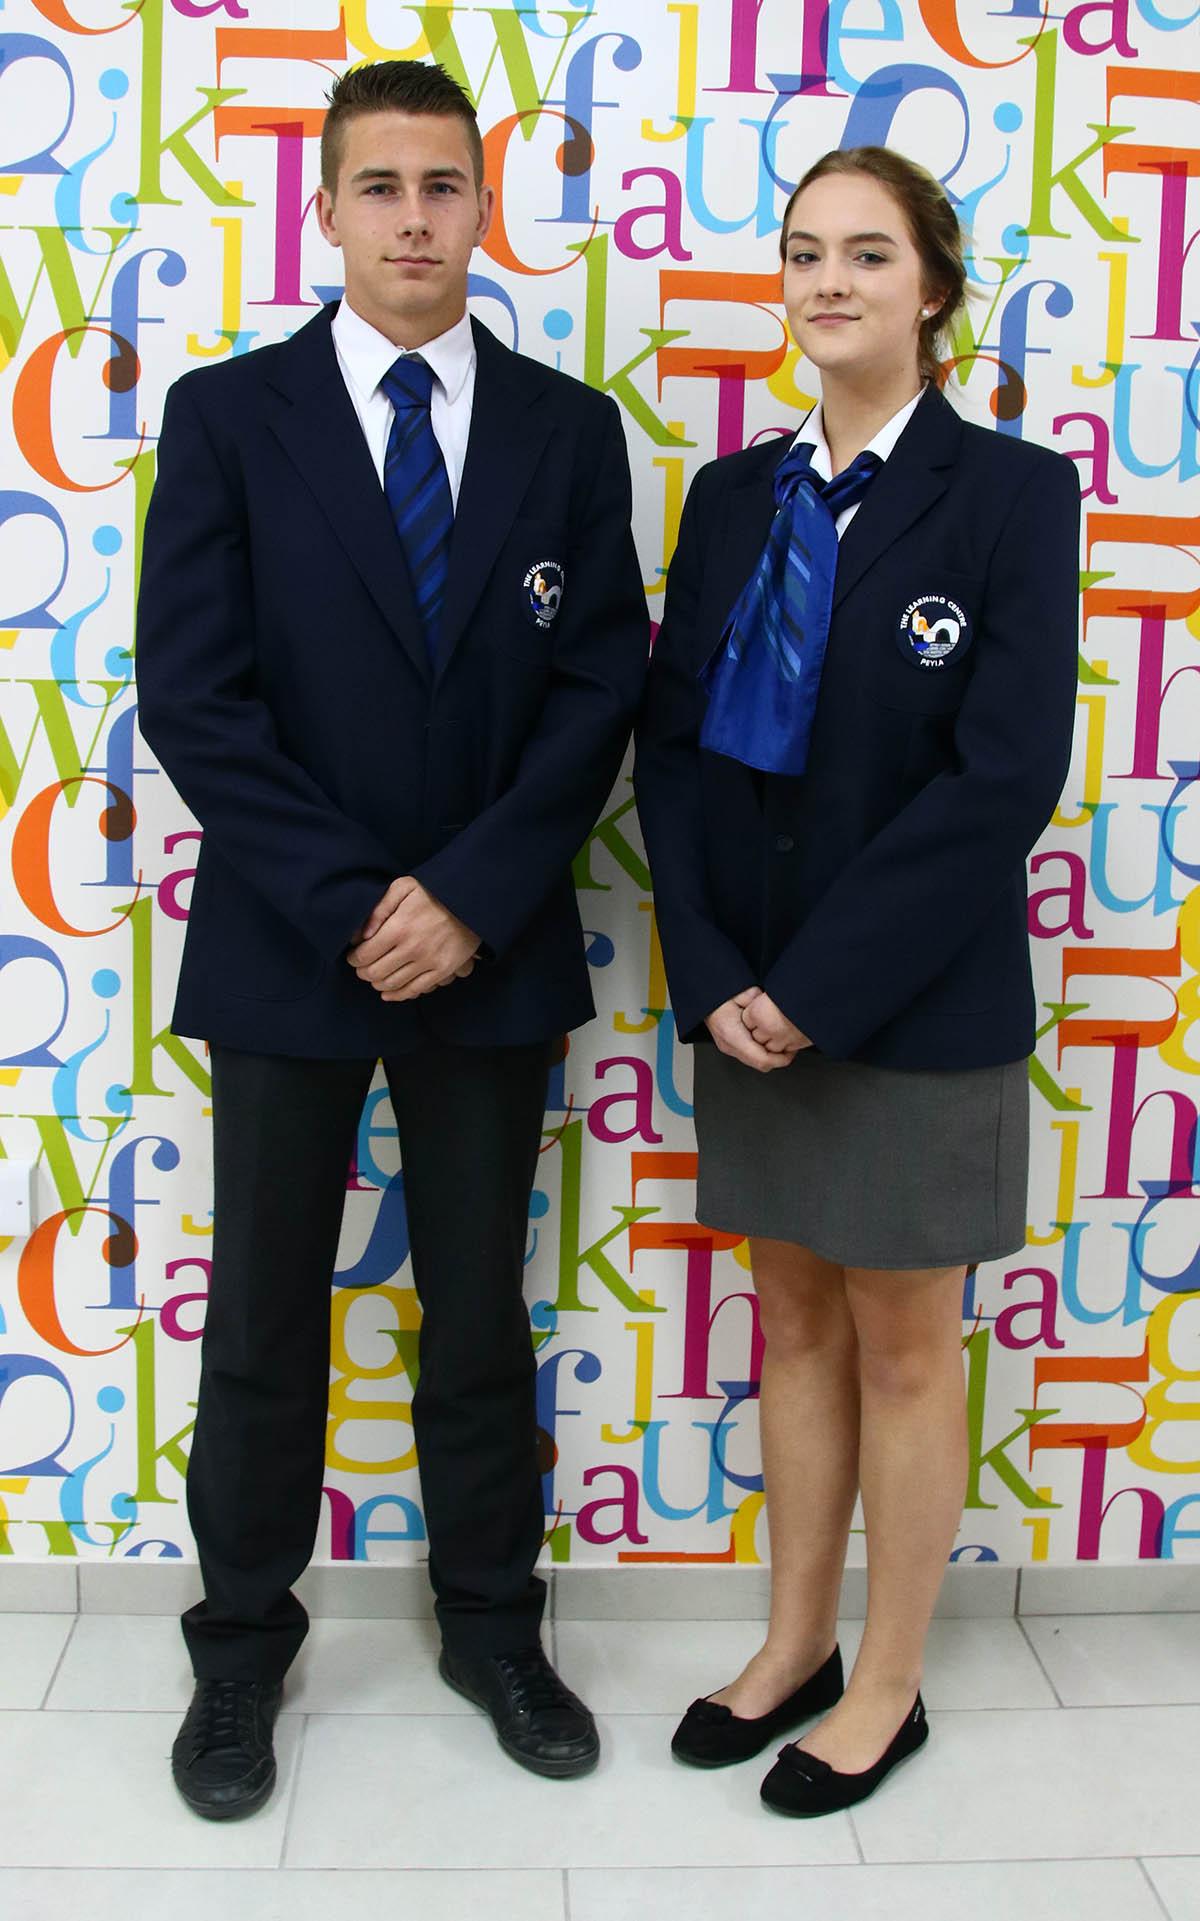 TLC Private School - School Uniform - 6th Form